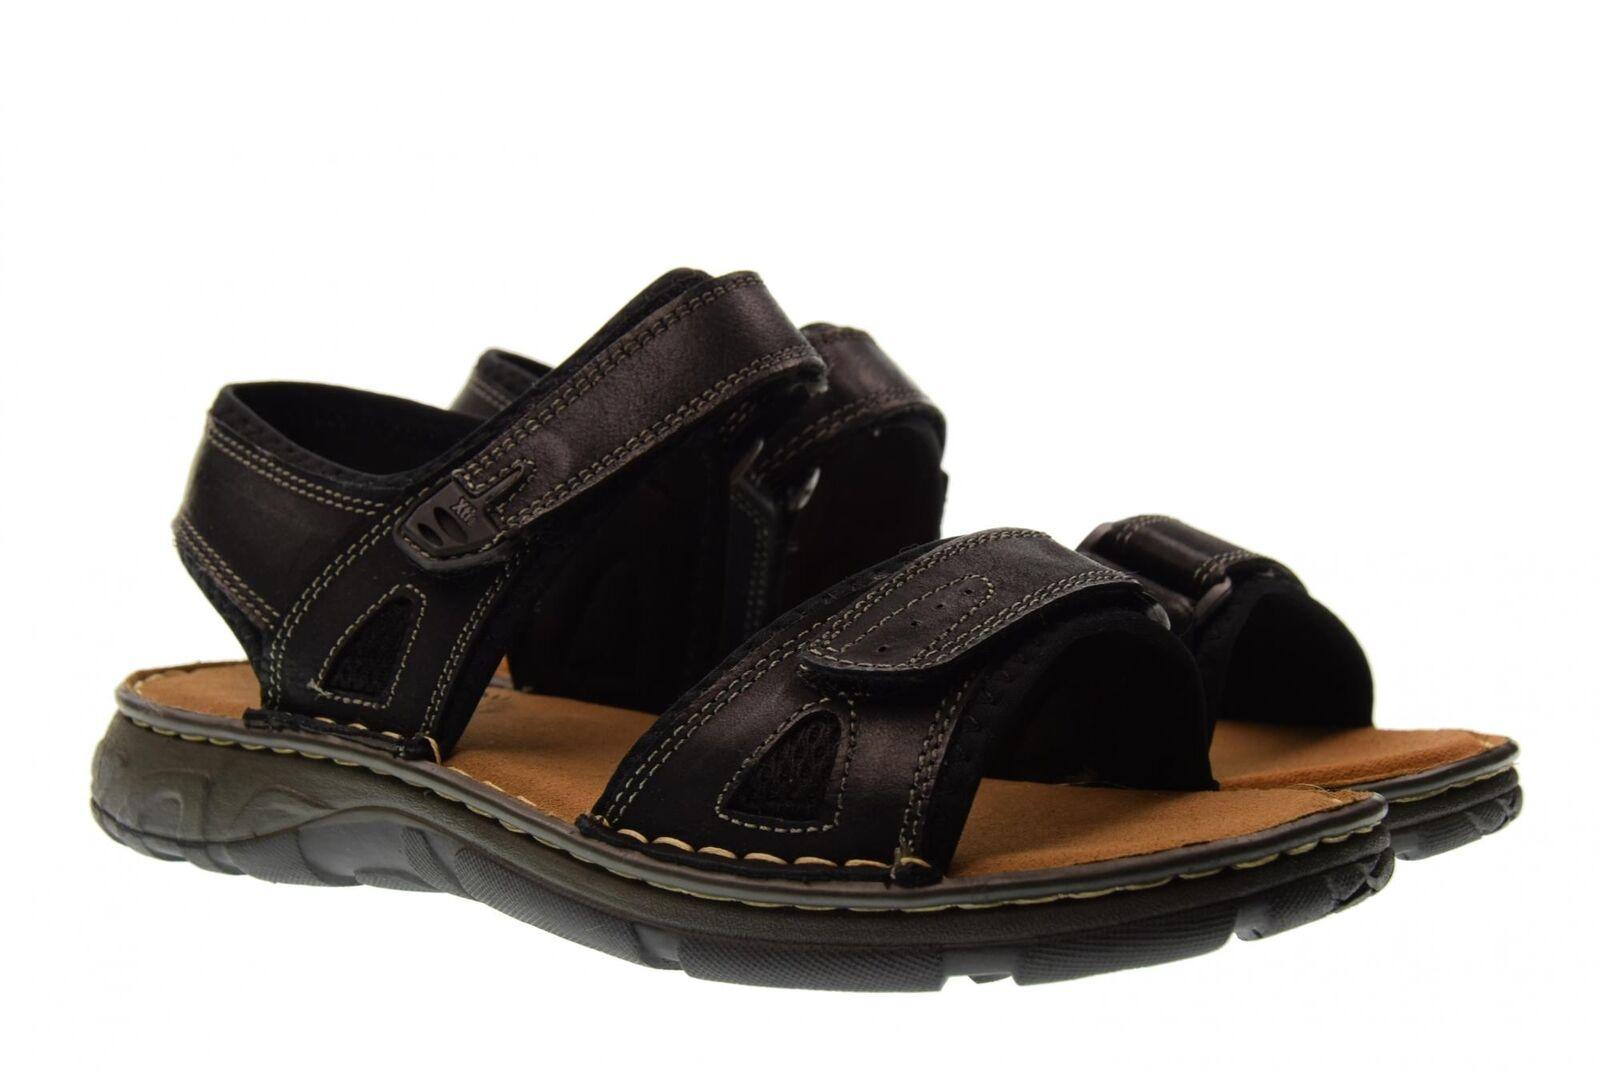 Xti scarpe uomo sandali 47128 NAPA NERO P18